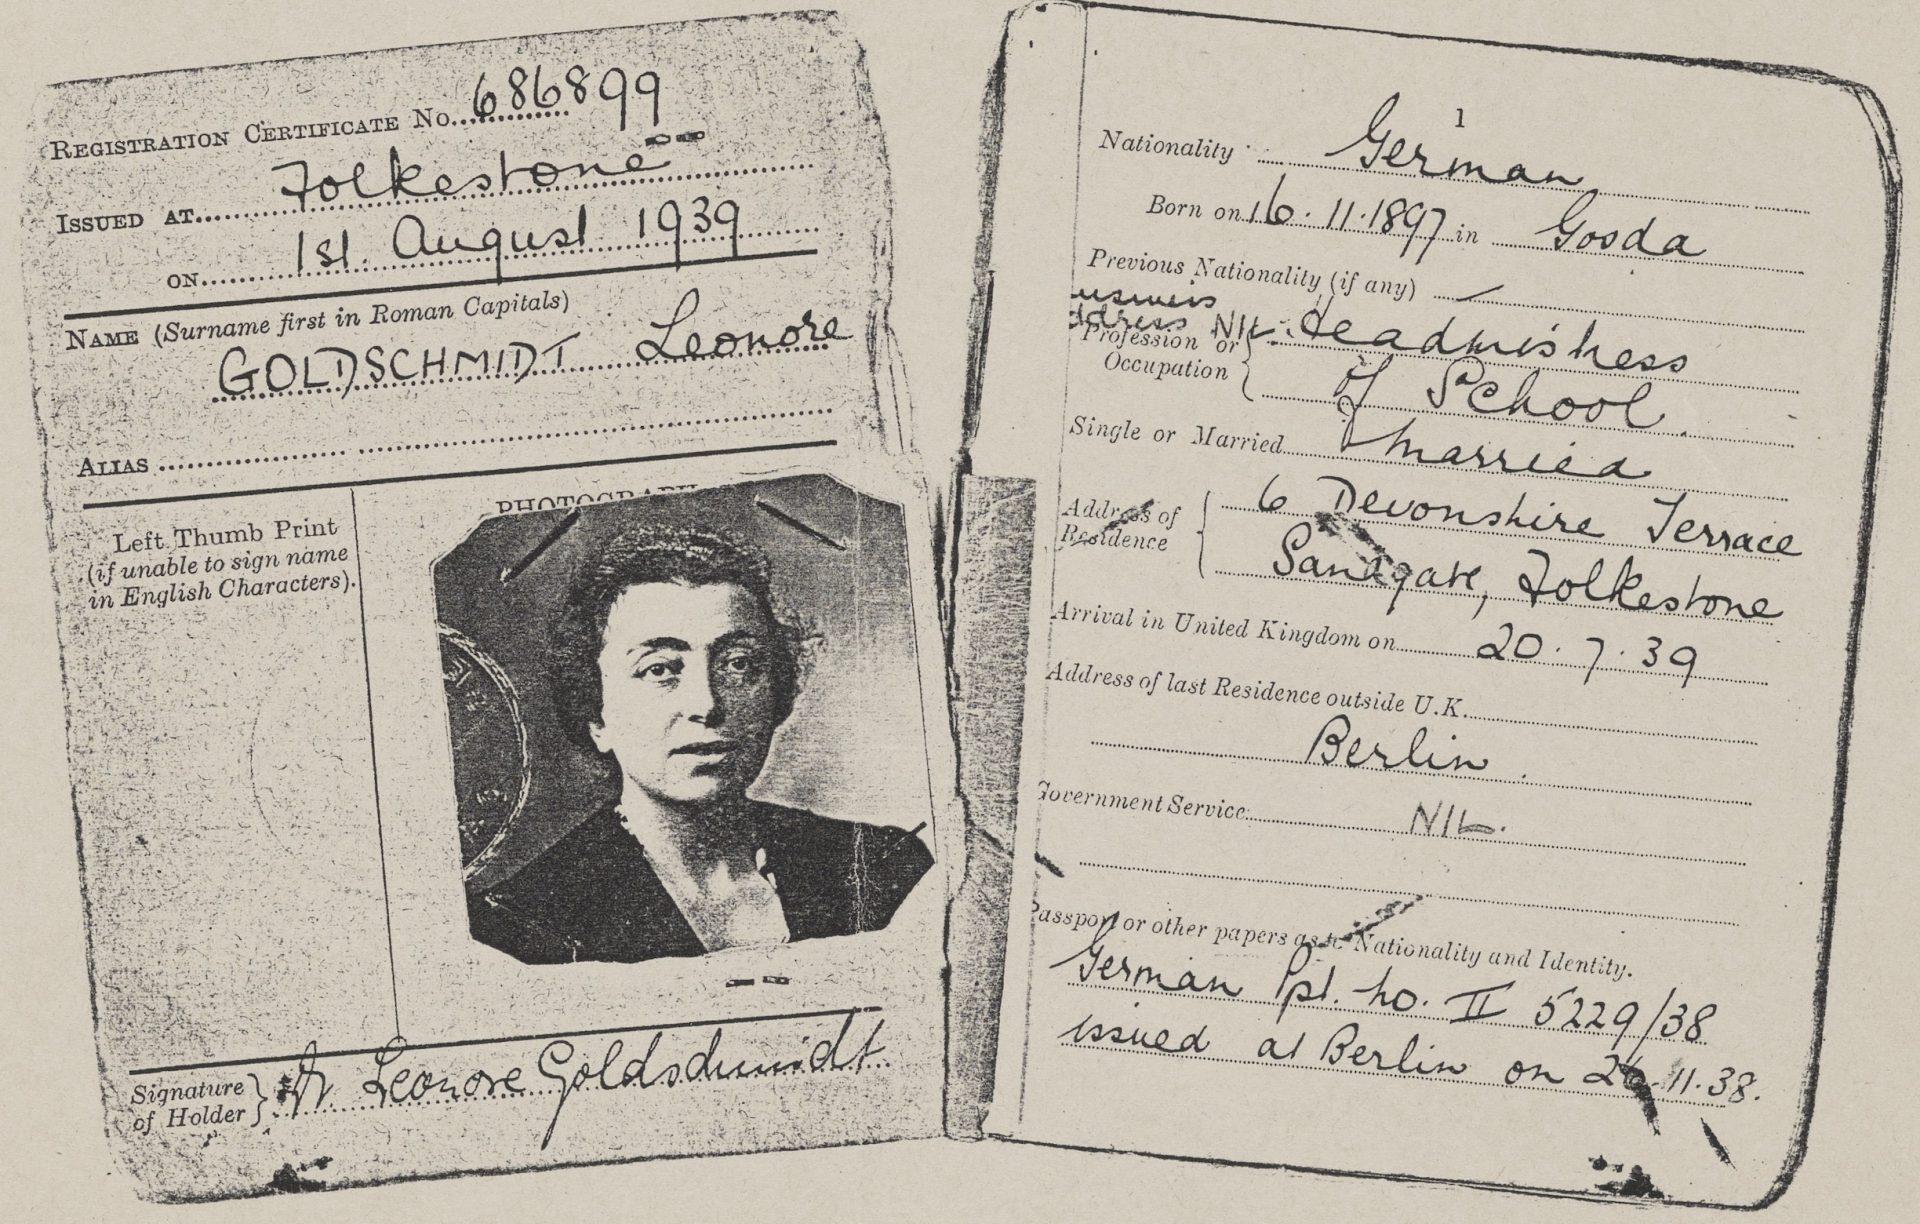 Leonore Goldschmidt Registrierungskarte